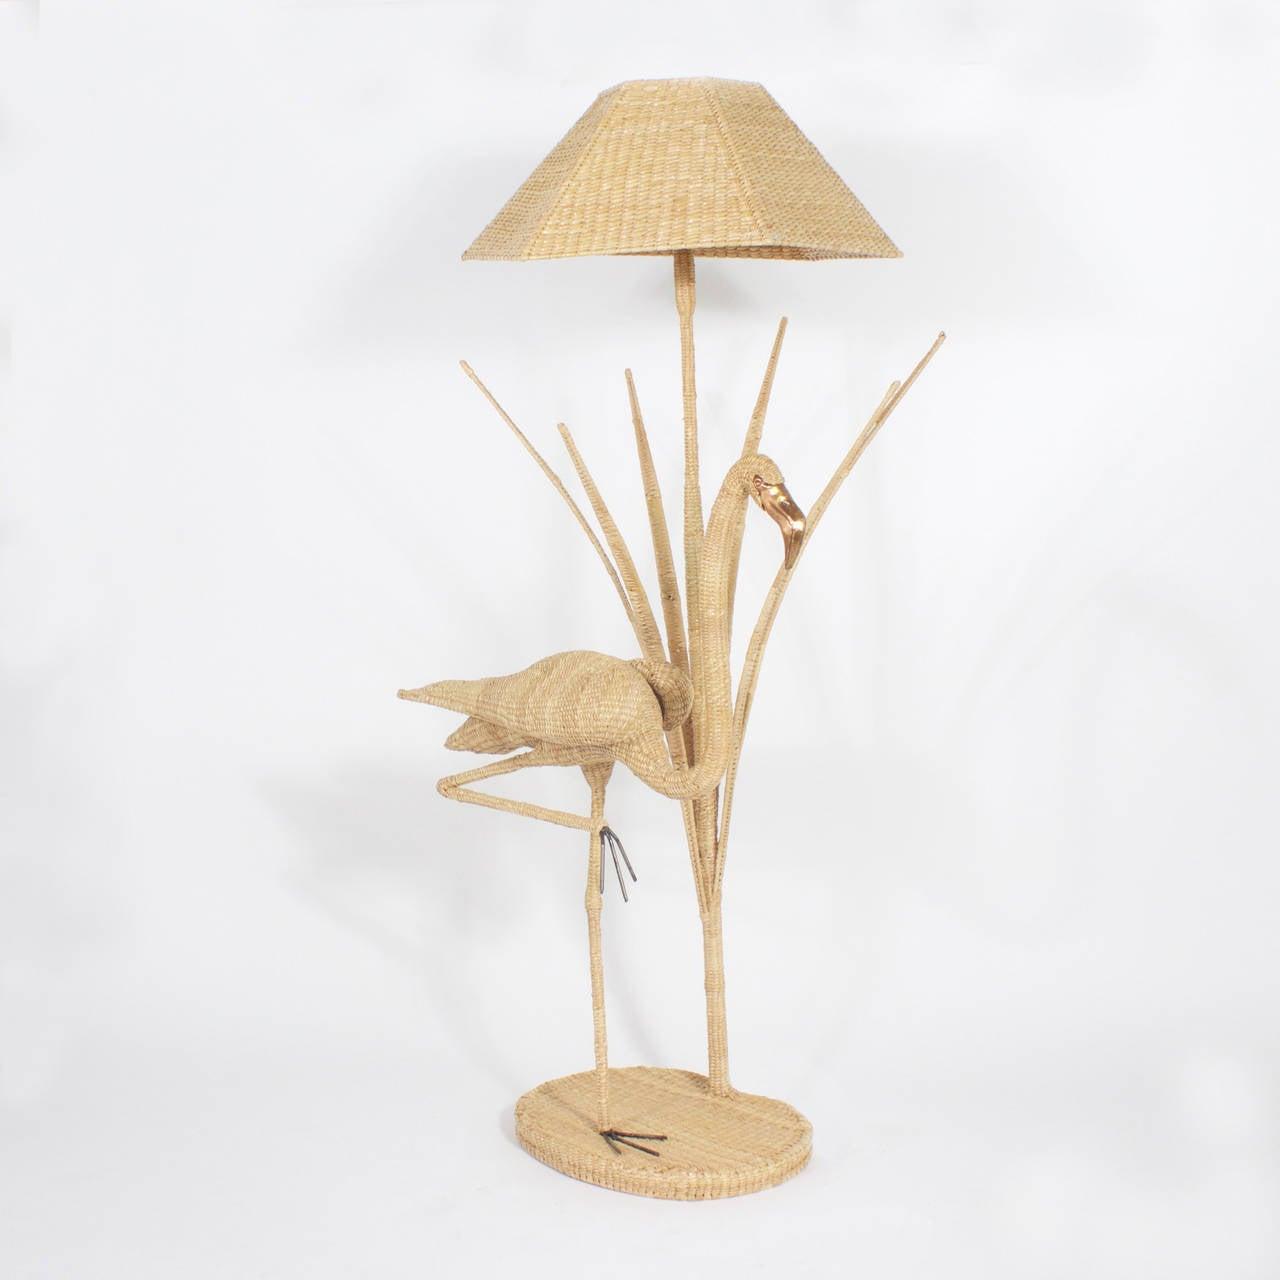 Mario Torres Flamingo Floor Lamp In Good Condition For Sale In Palm Beach, FL